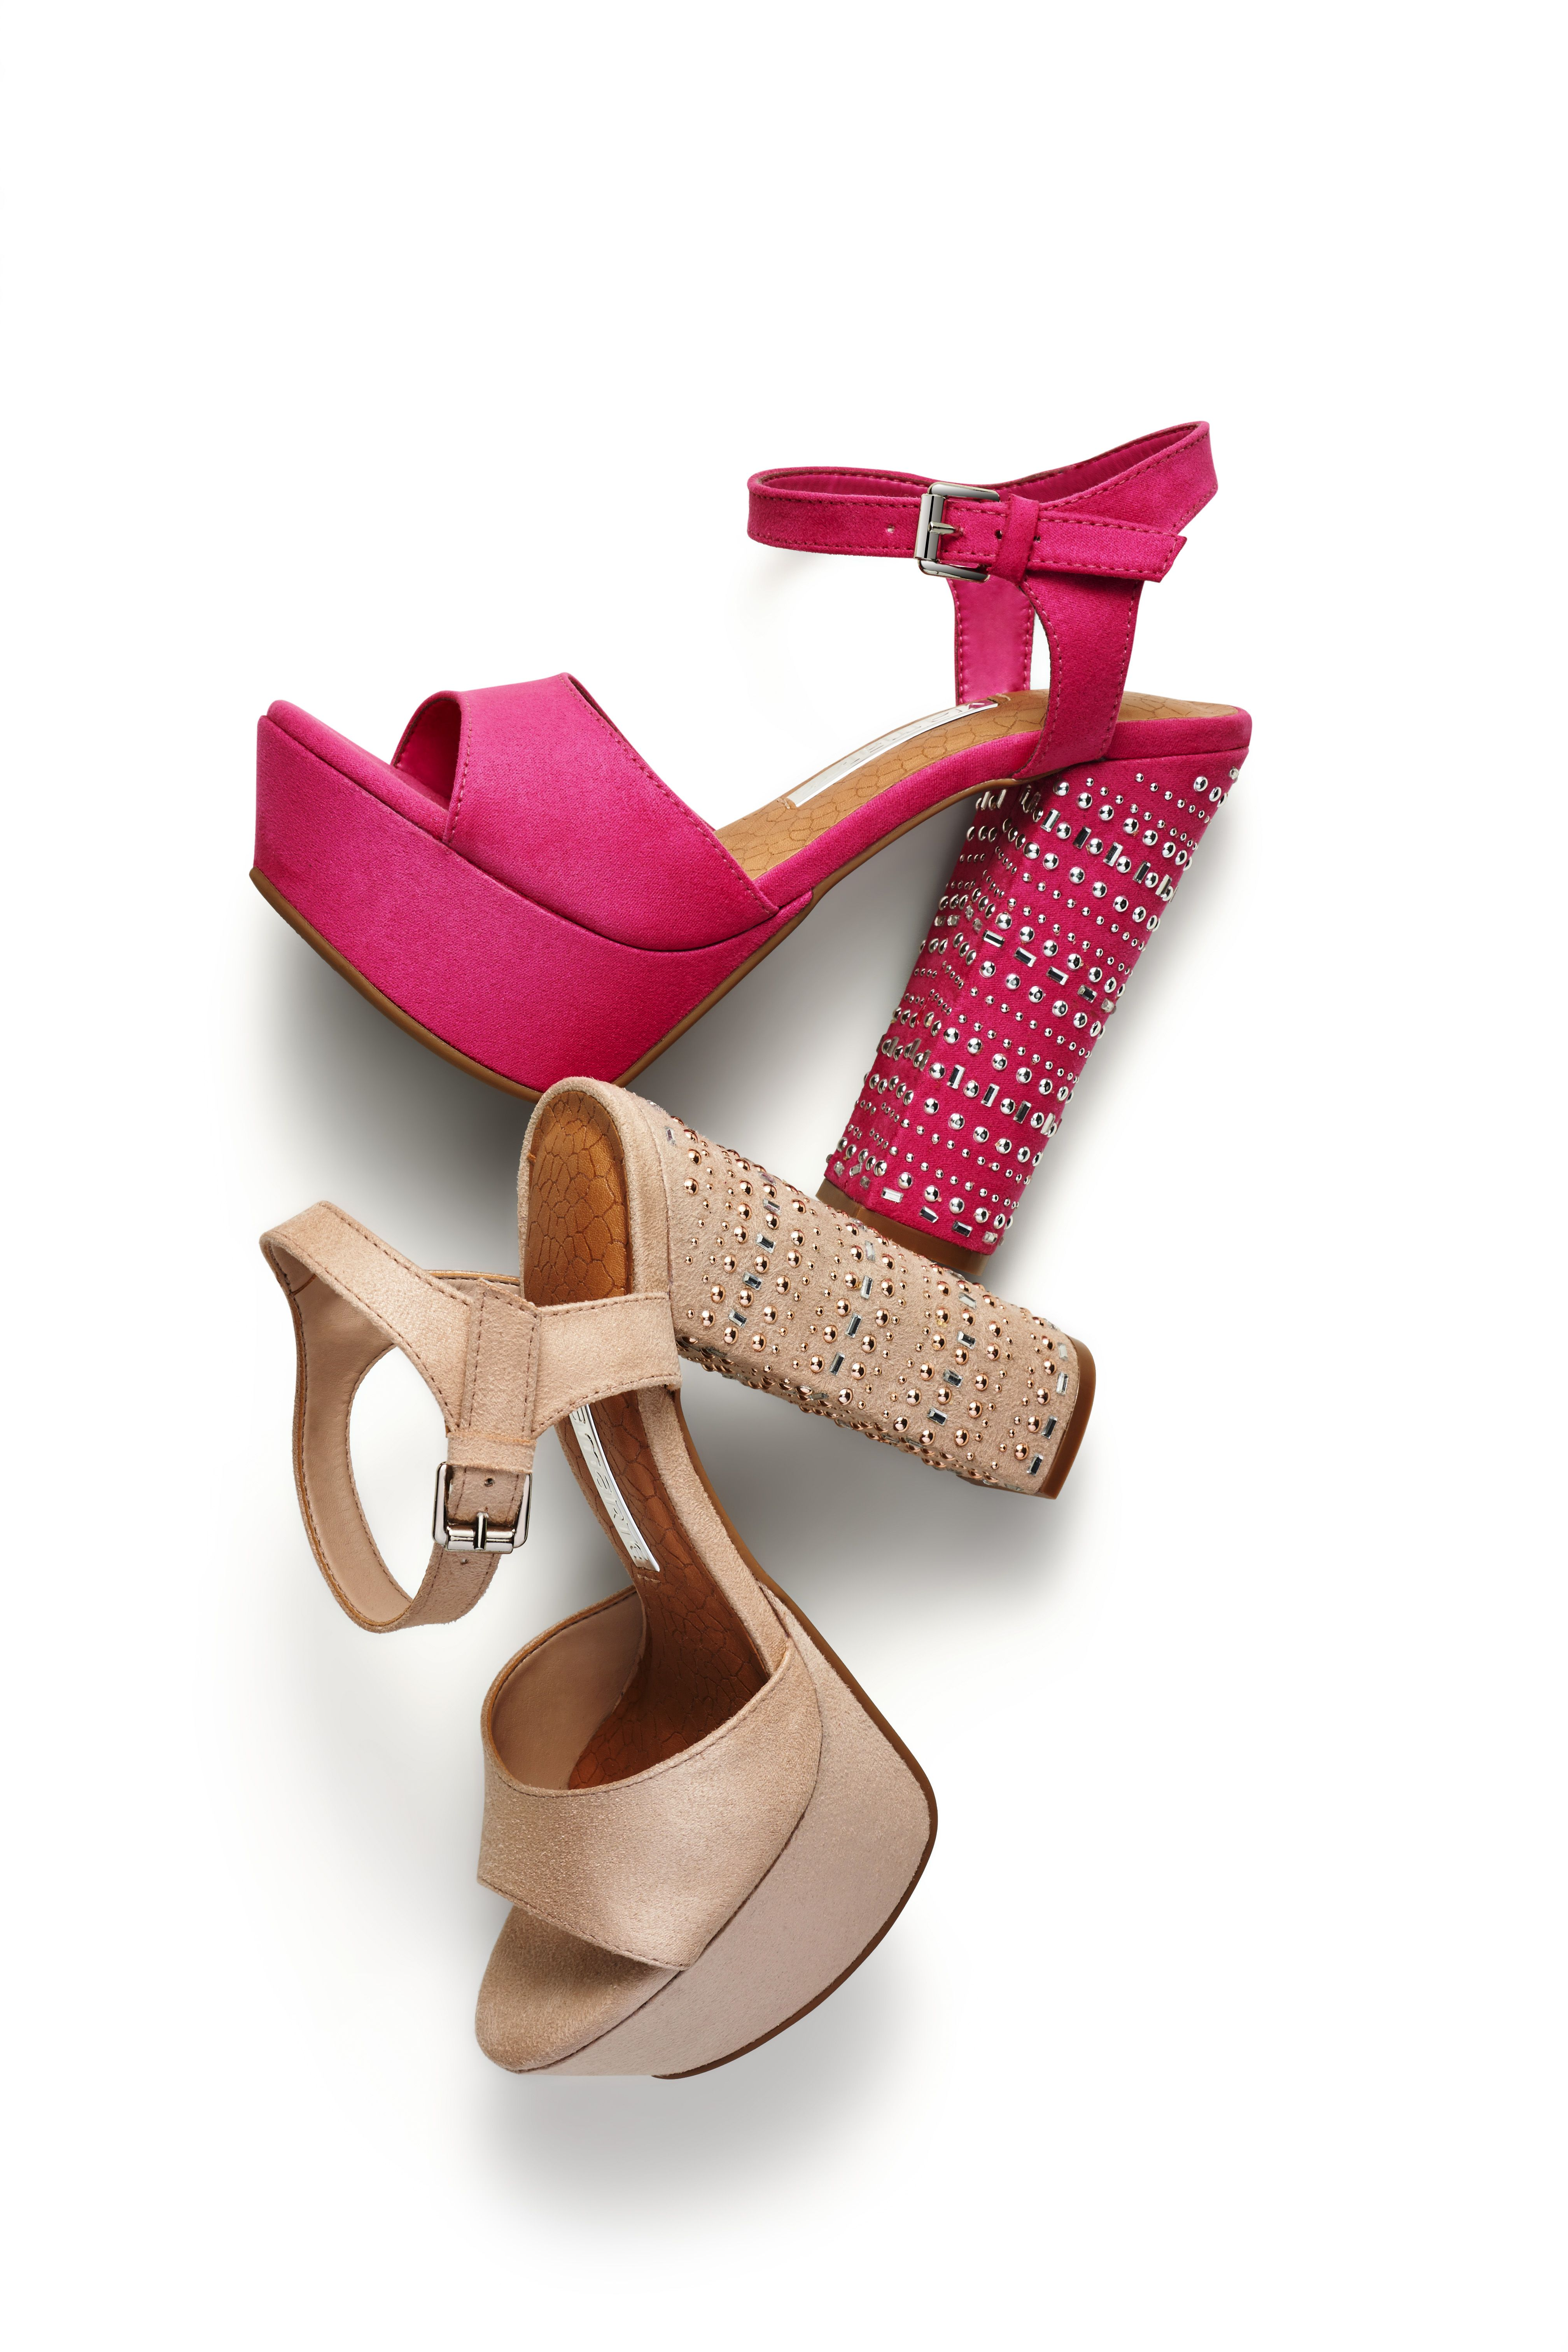 sandálias salto alto - salto grosso - nude- pink - high heels - summer shoes